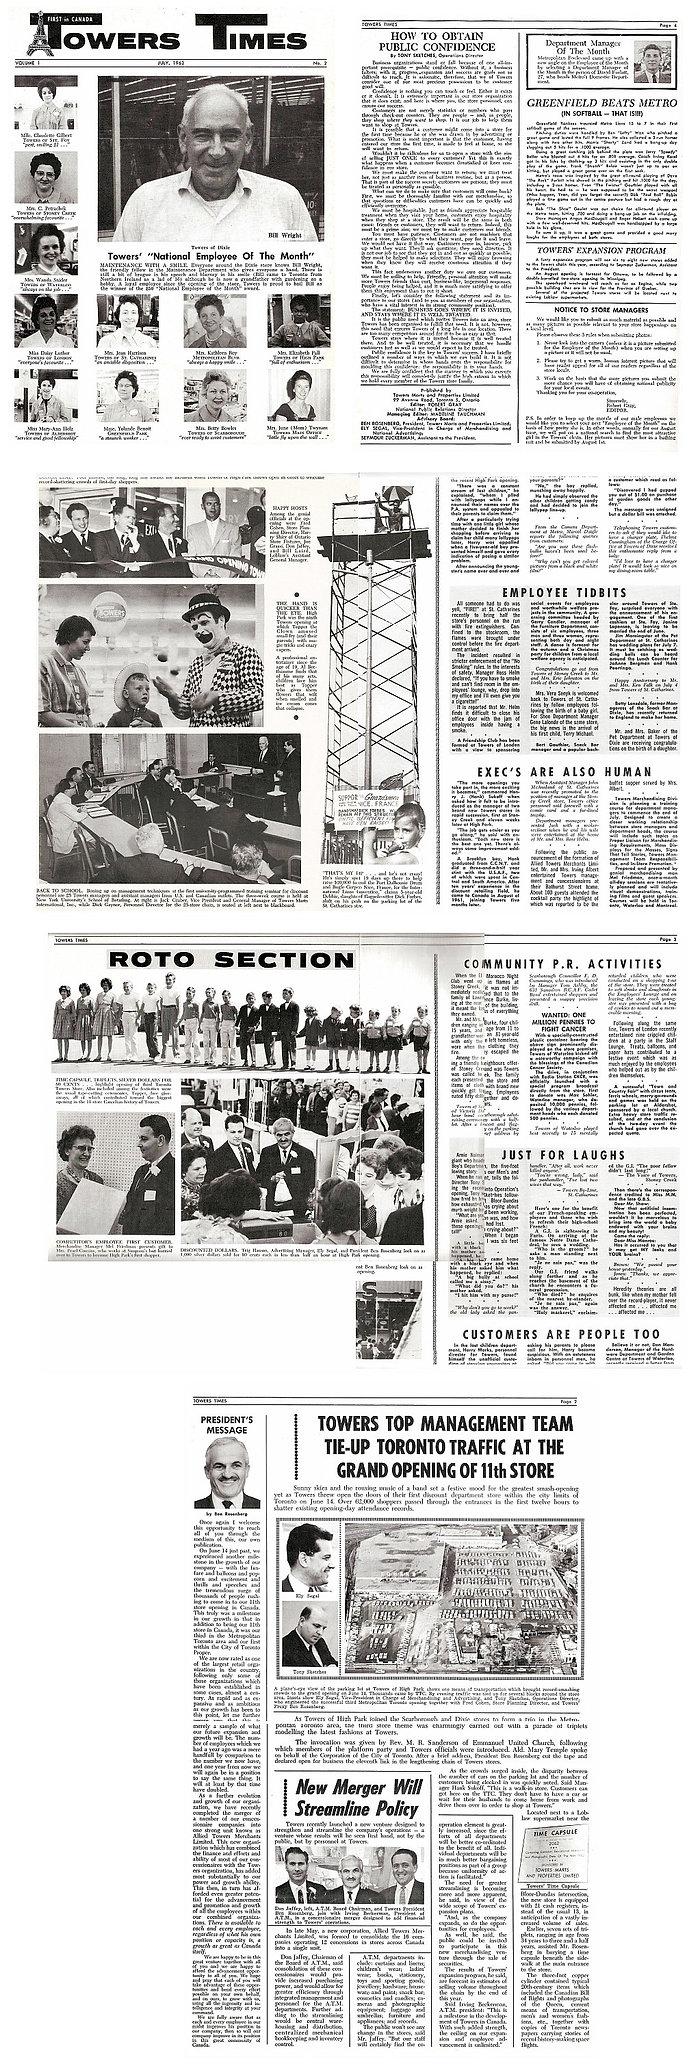 towers_times_july_1962_volume_1_no_2_b.j